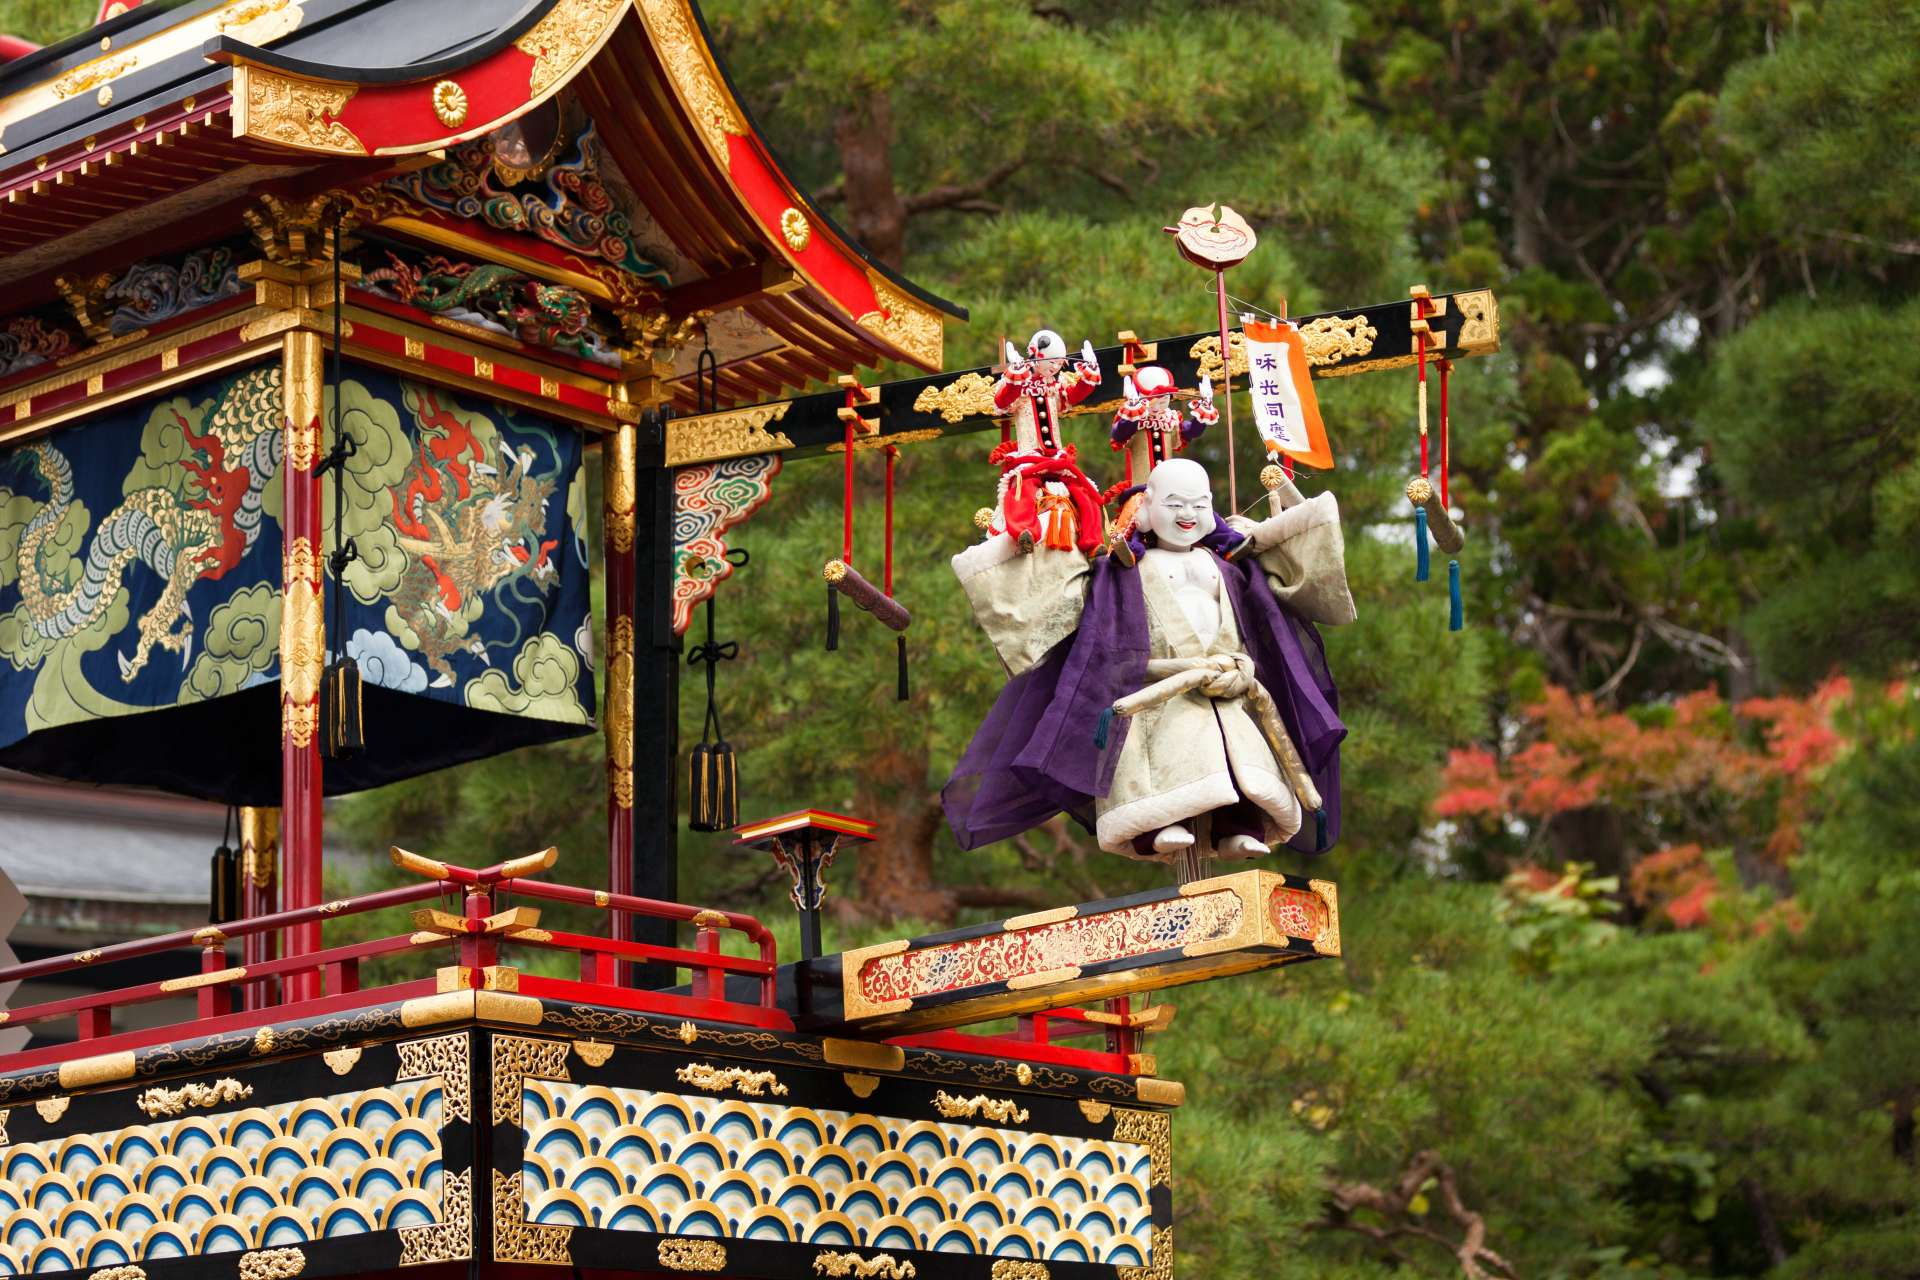 Takayama Matsuri – Autumn Yahata Matsuri (Image)